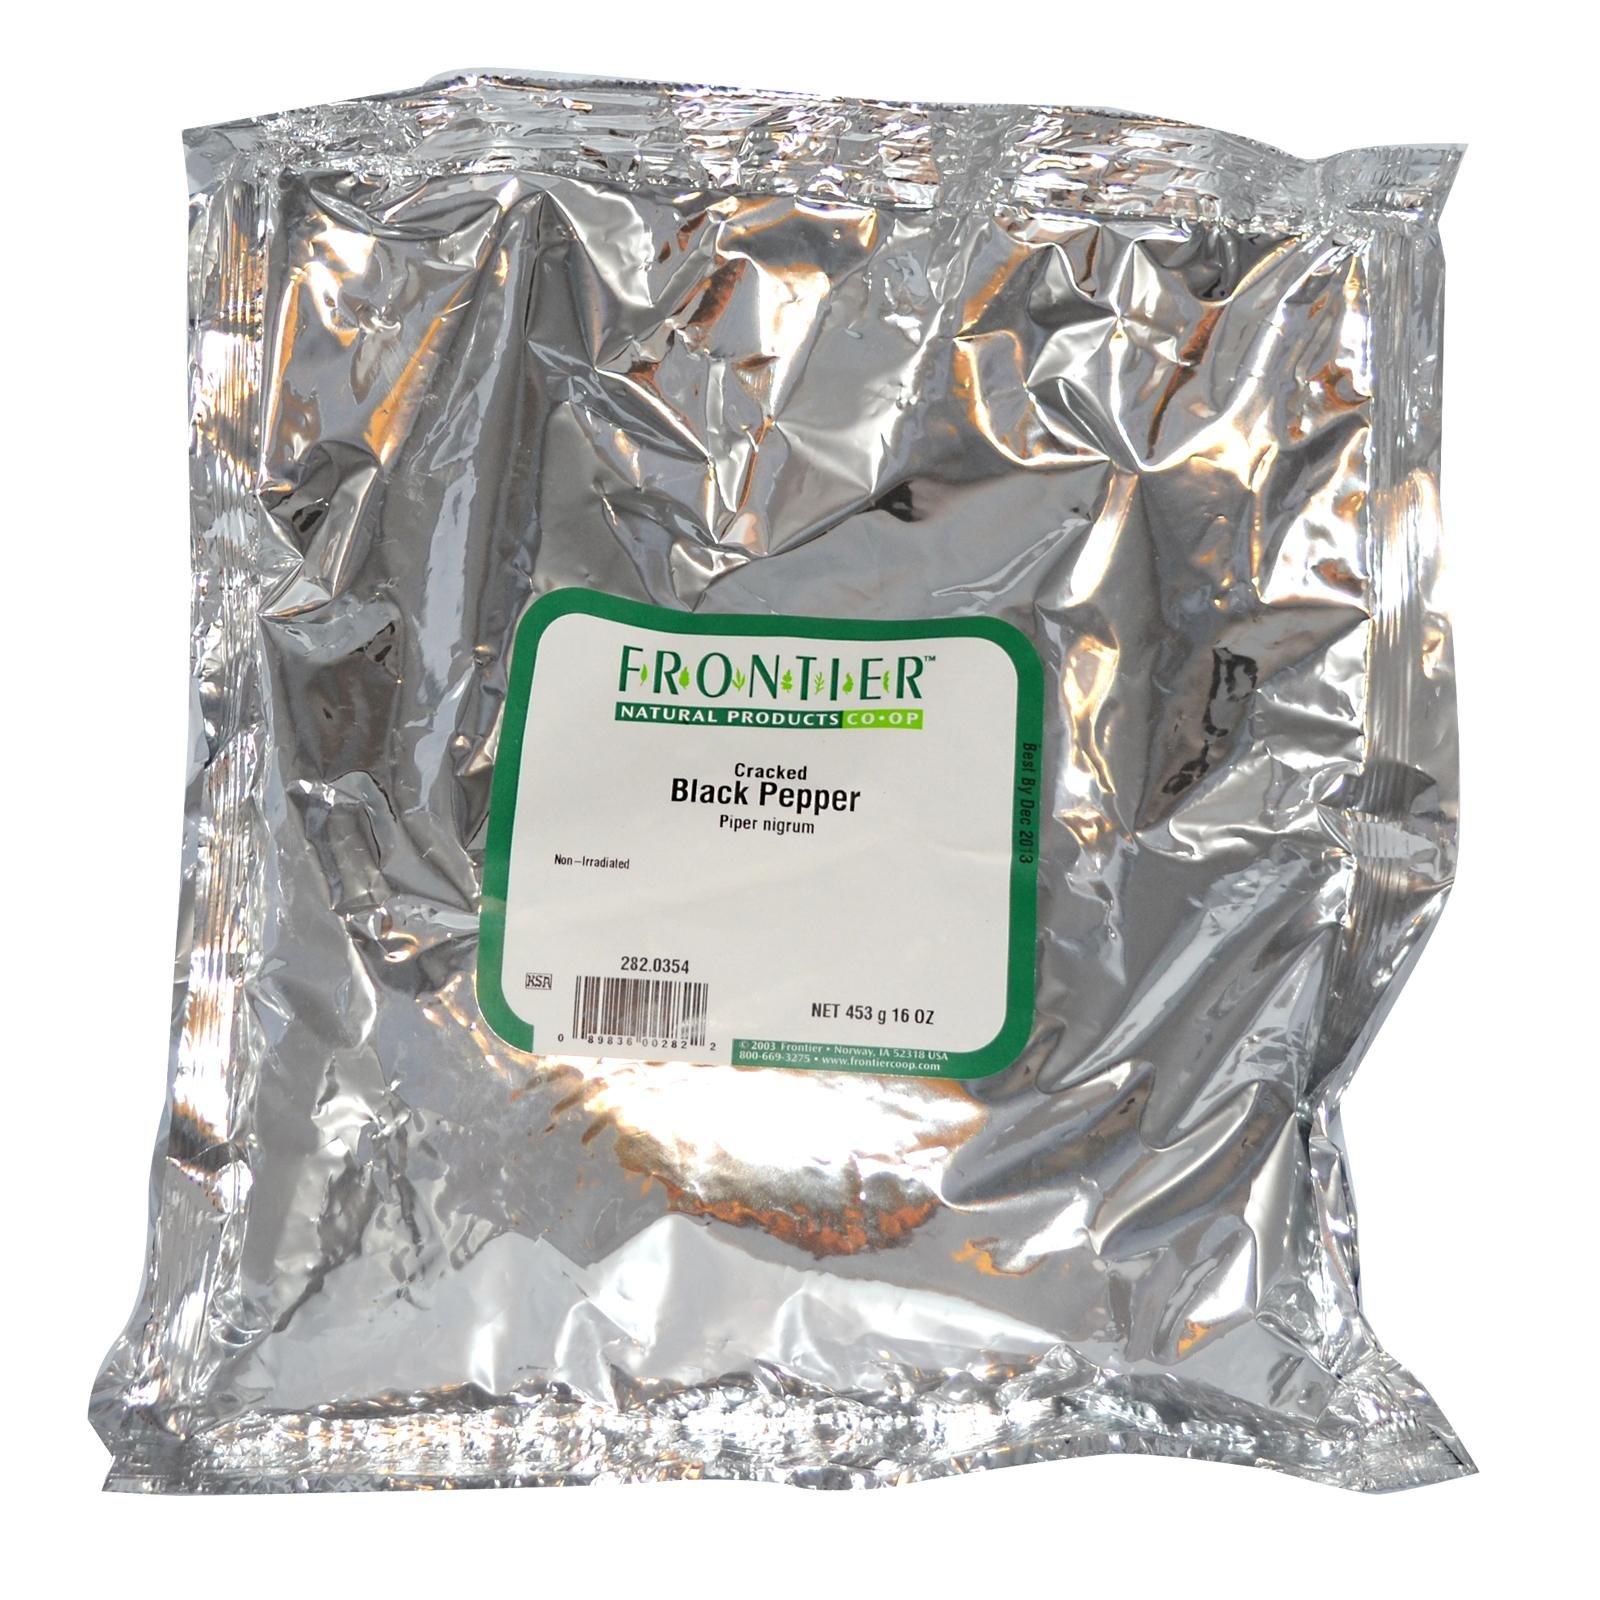 Black Pepper Cracked 10 Mesh - 1 lb,(Frontier)